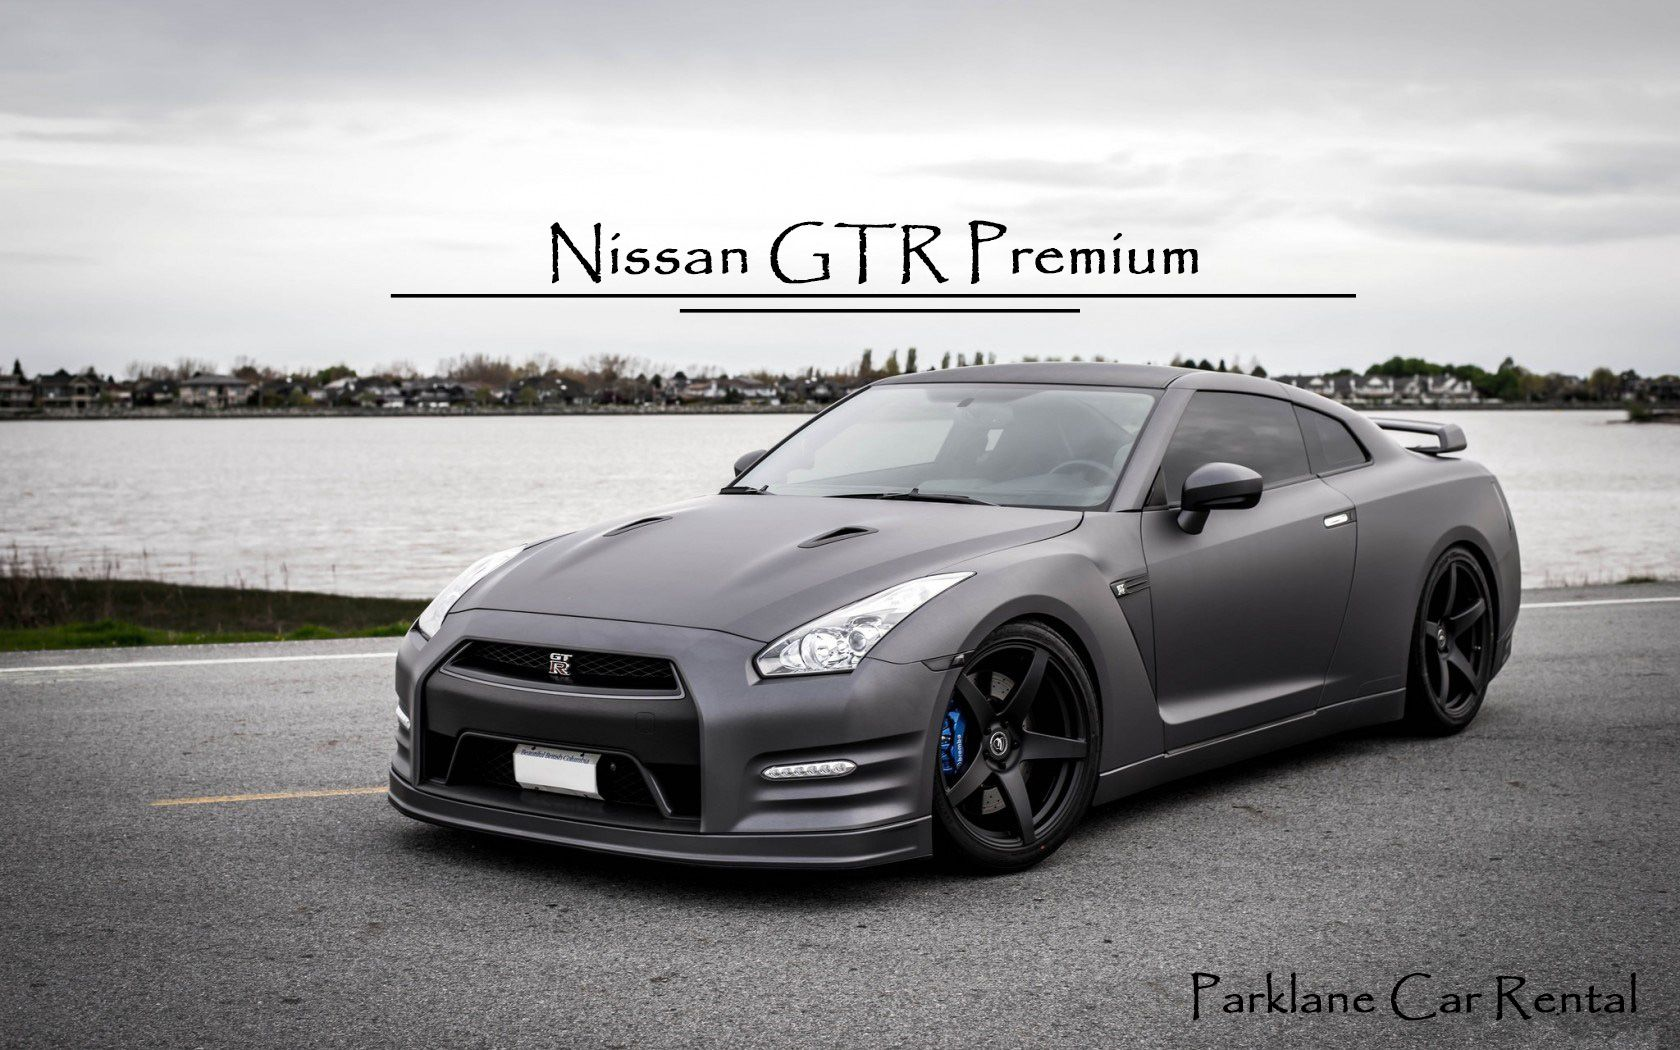 Nissan gtr premium definition of speed in 3 words 0 60 mph in 2 7 secs